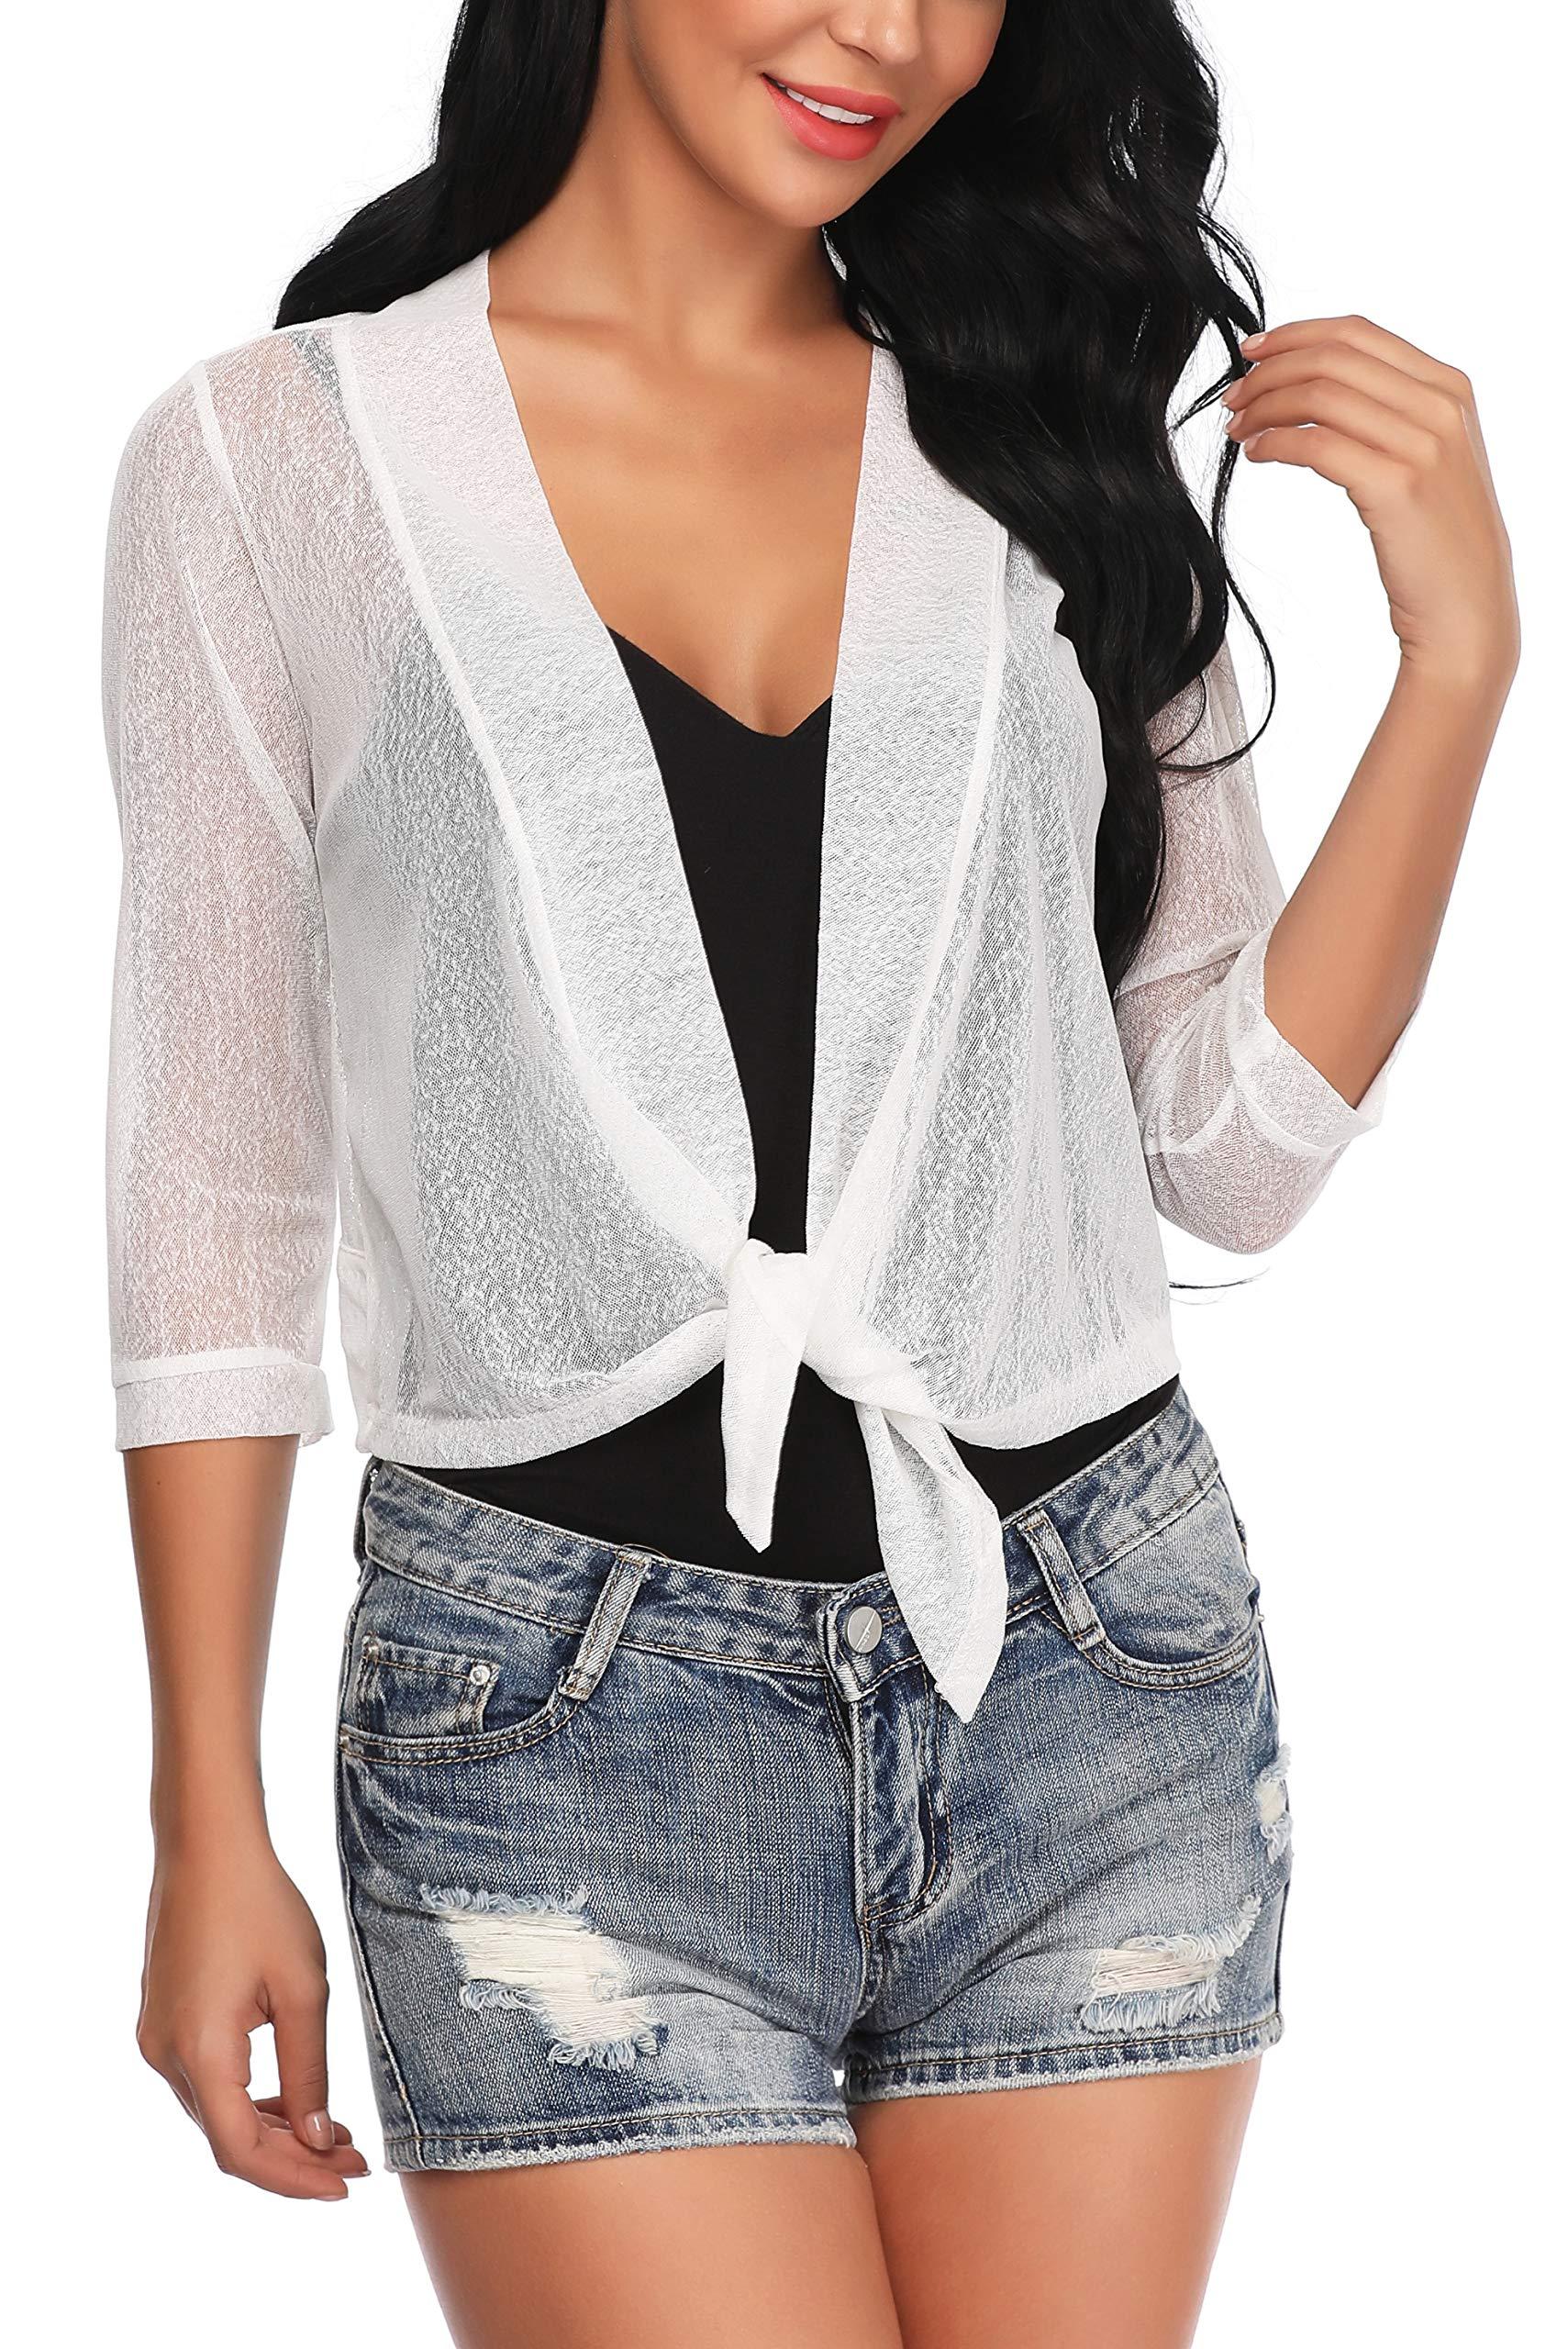 Aranmei Womens Sheer Shrug Cardigan Tie Front 3/4 Sleeve Bolero Jacket(White, Large)